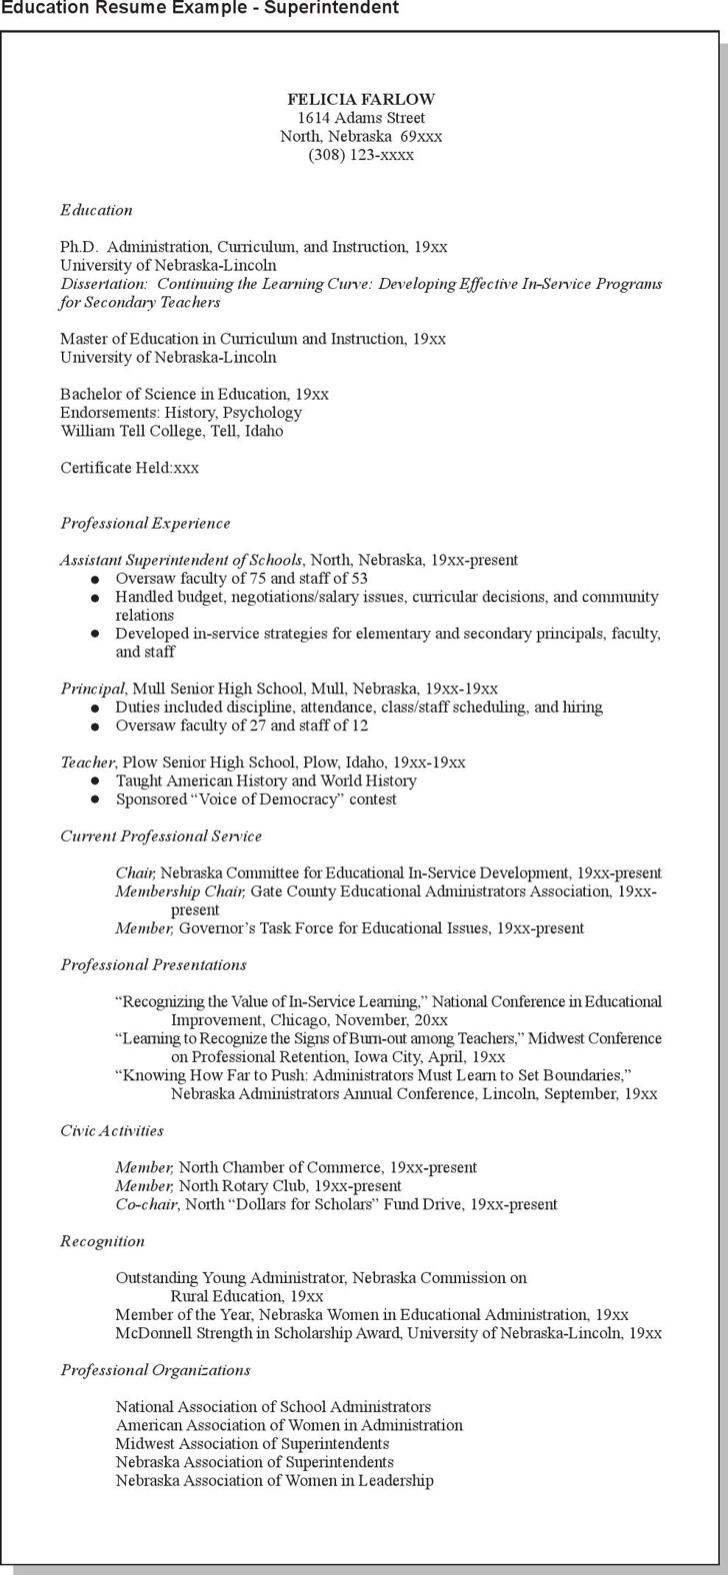 Superintendent Education Resume Example